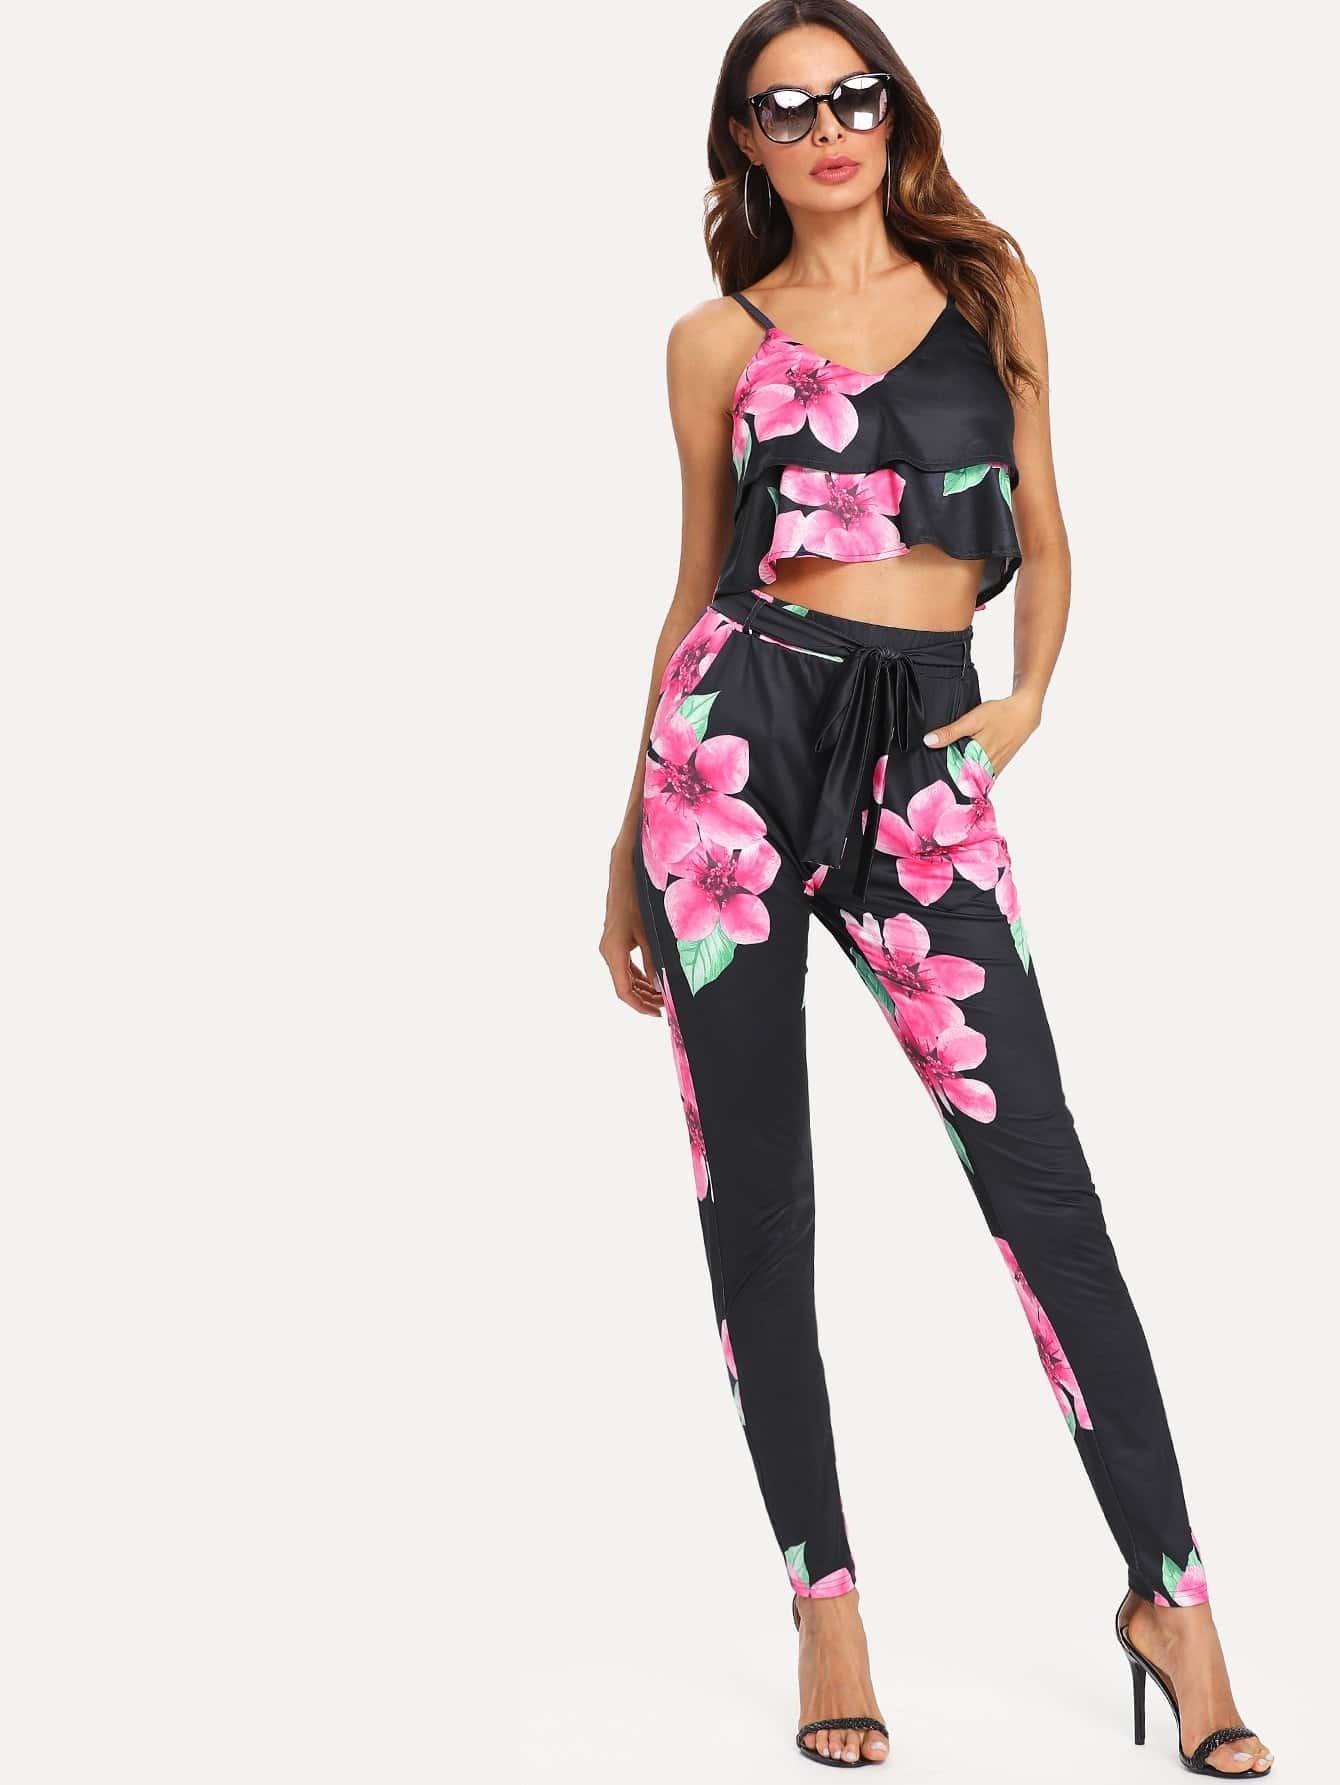 Floral Print Crop Cami Top With Pants floral print crop cami top with shorts